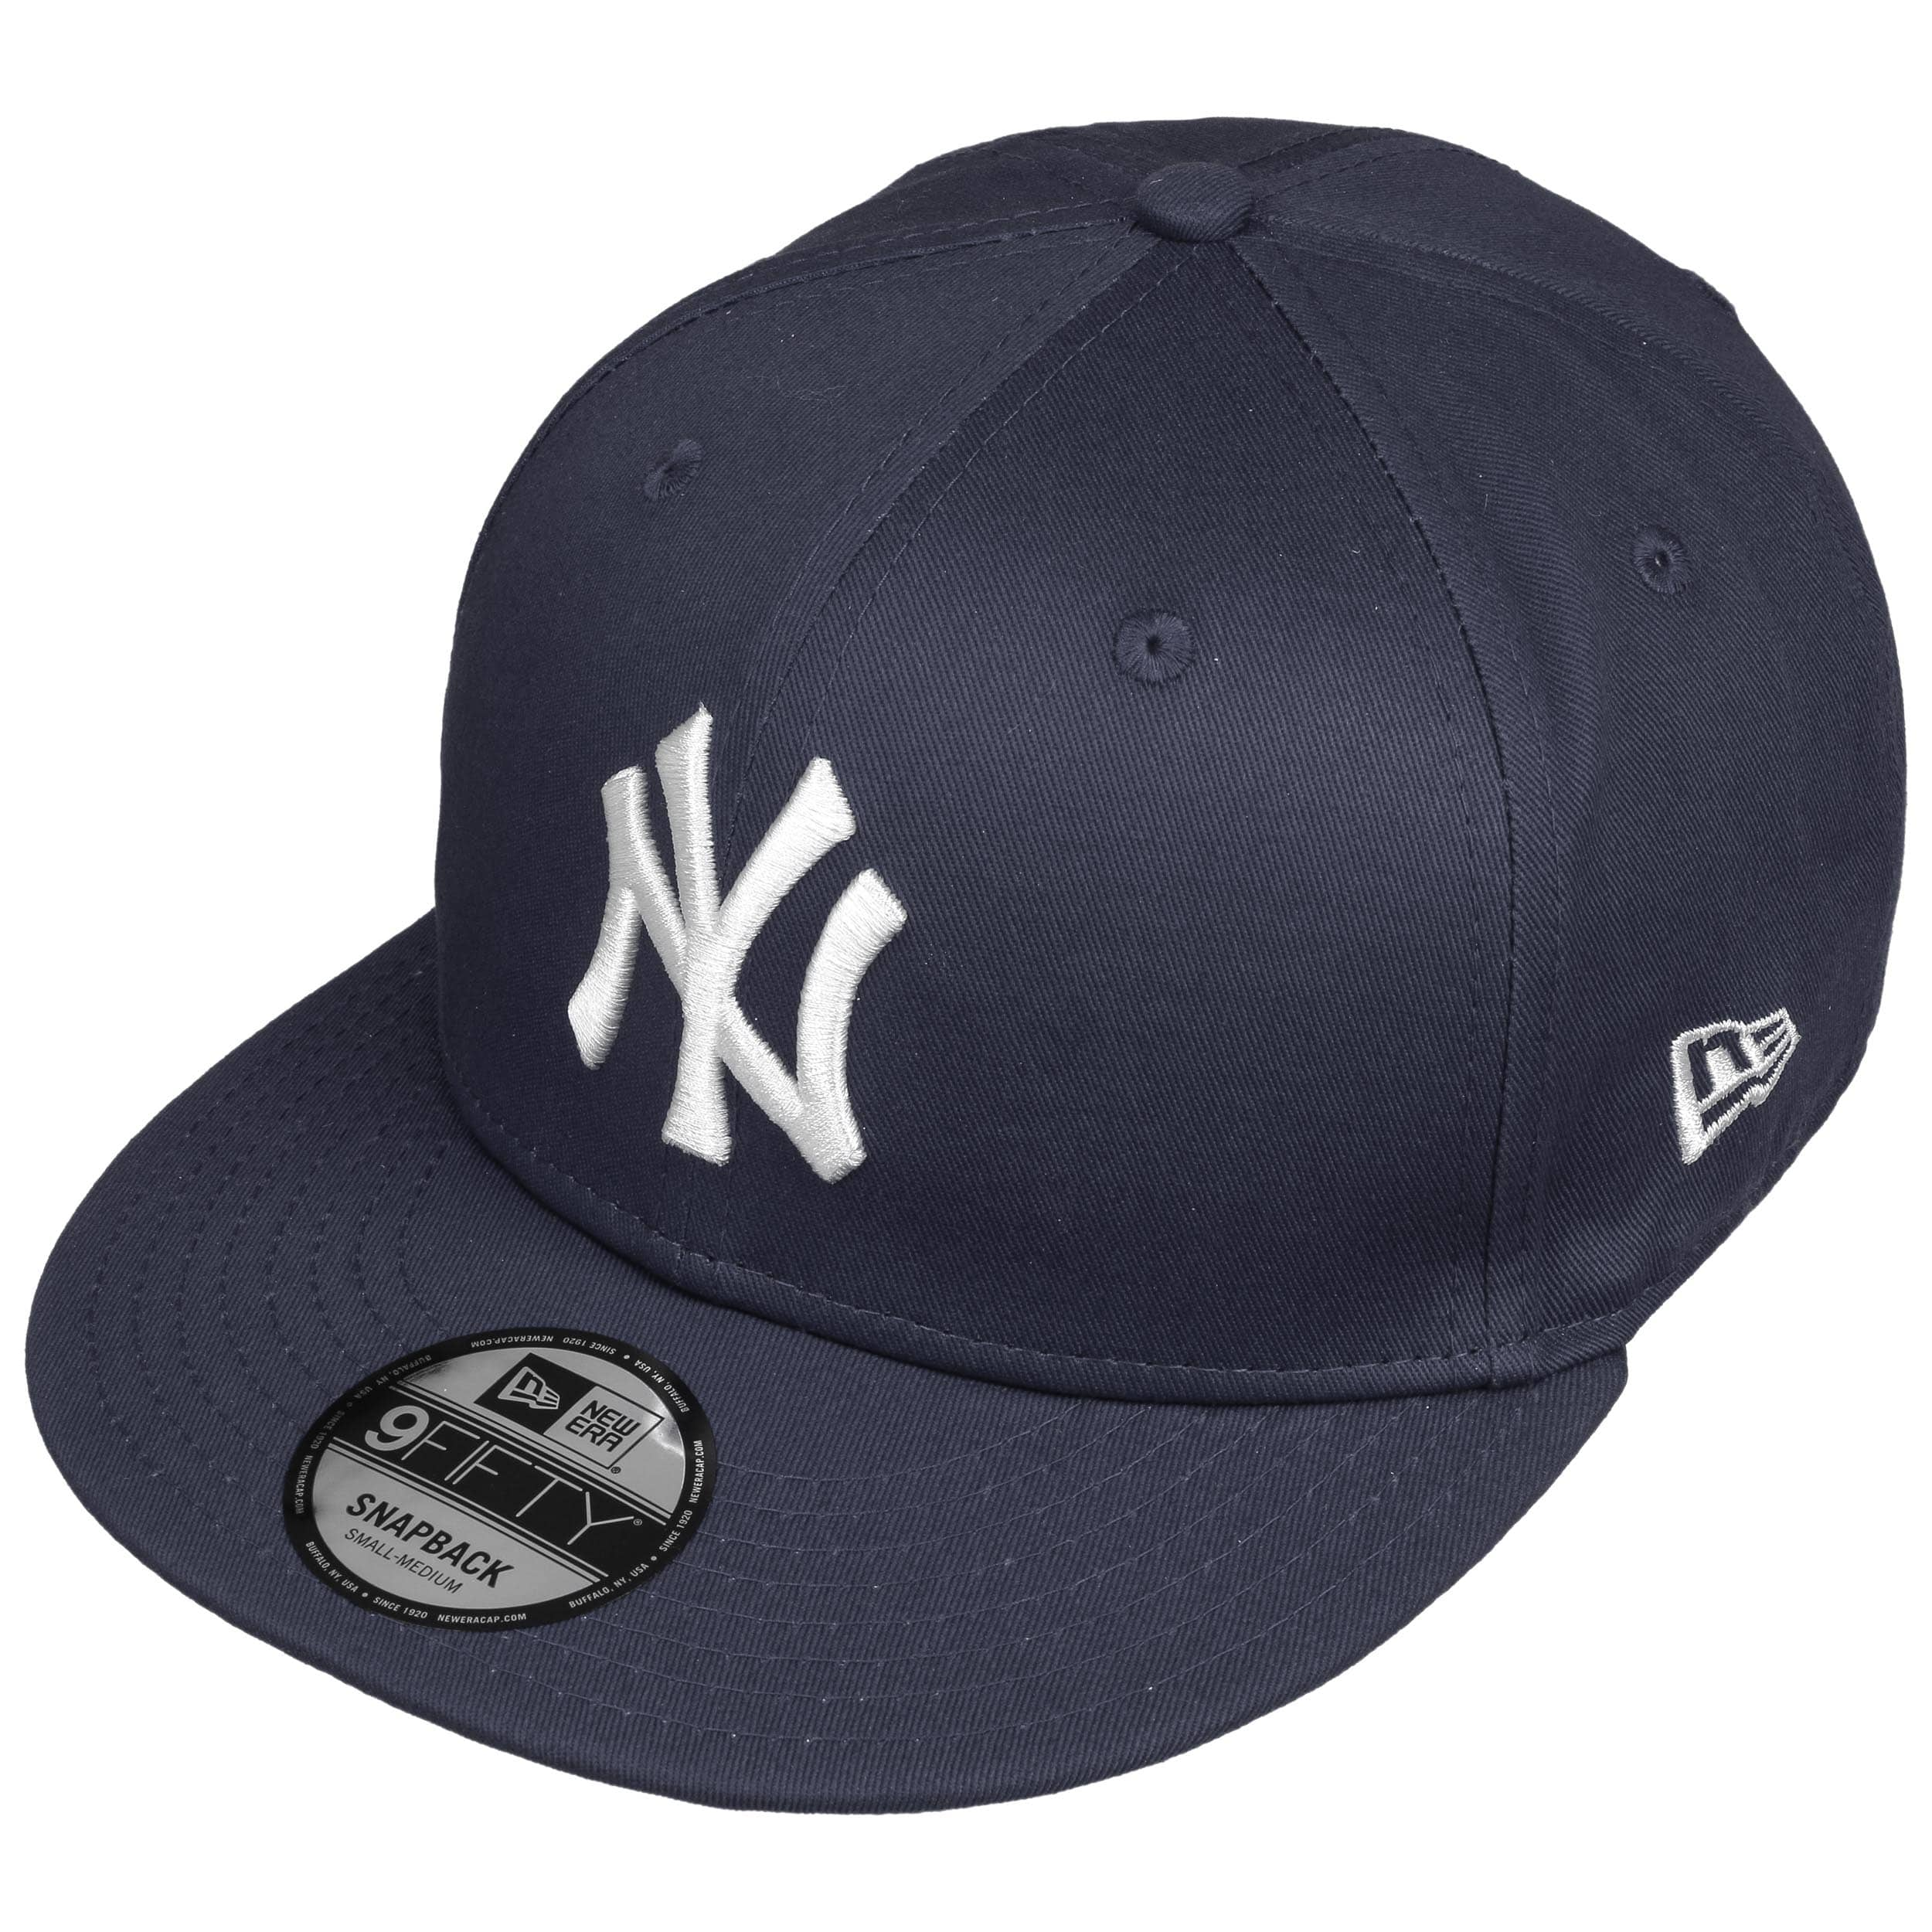 23c70cba69c17 Gorra 9Fifty Ess NY Yankees by New Era - Gorras - sombreroshop.es